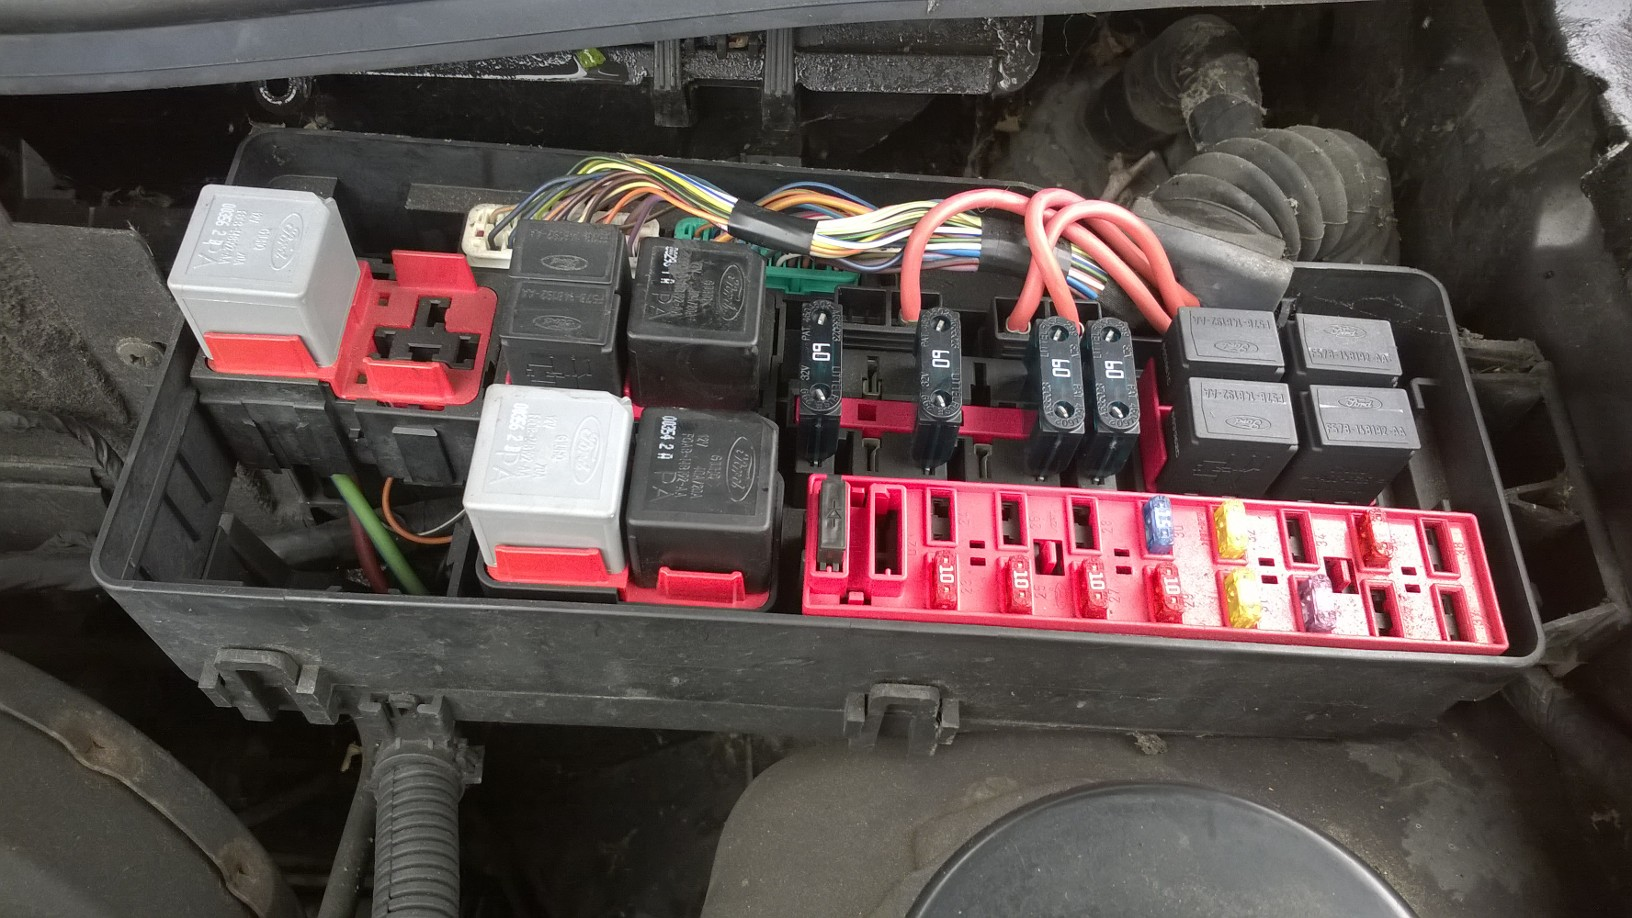 Fiesta mk4 fuel pump relay - Ford Fiesta Club - Ford Owners Club - Ford  ForumsFord Owners Club